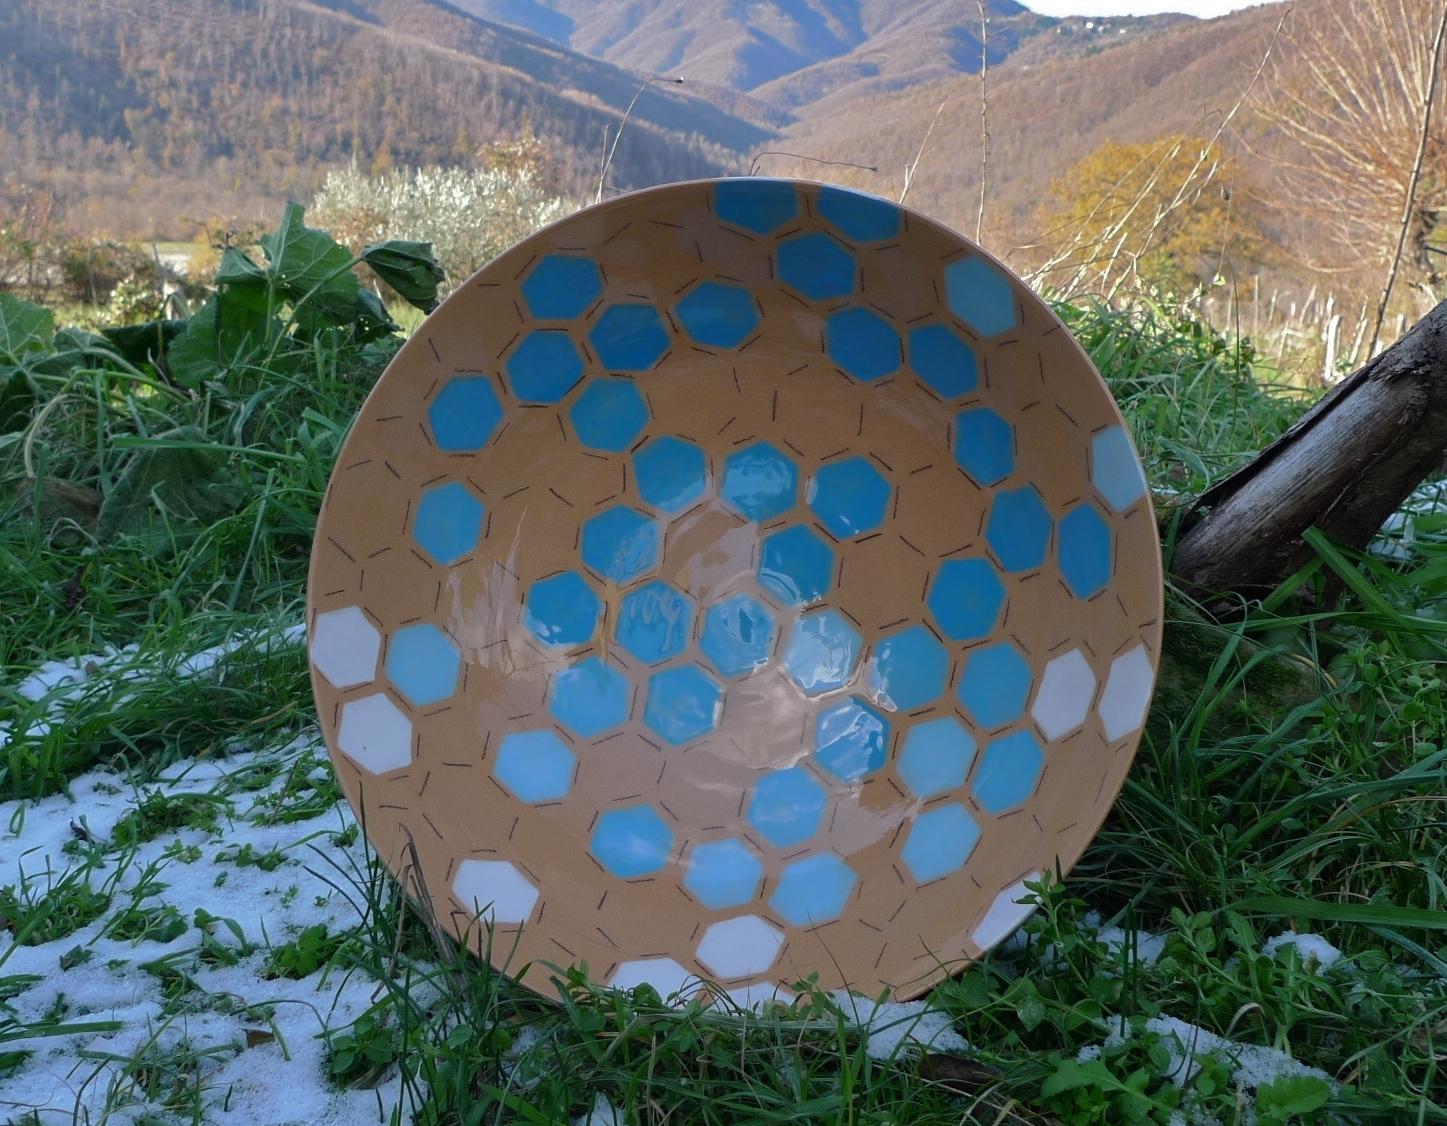 terra cotta ceramic body: bowl (blue, white hexagon with line) 15 x 40cm (350 E)